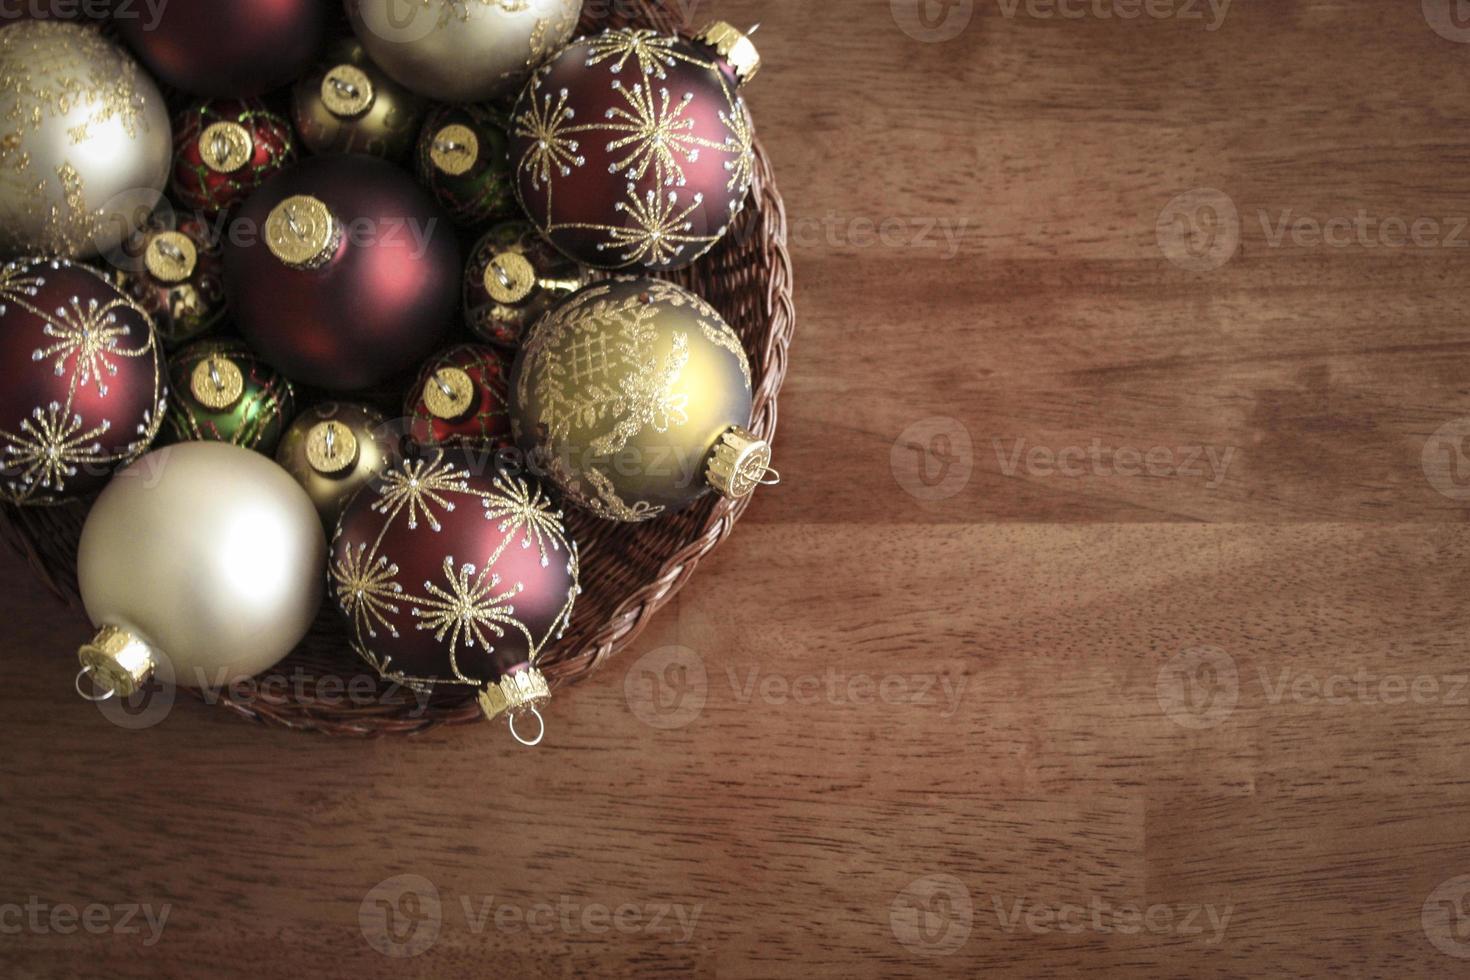 Aerial Christmas Ornaments Table photo